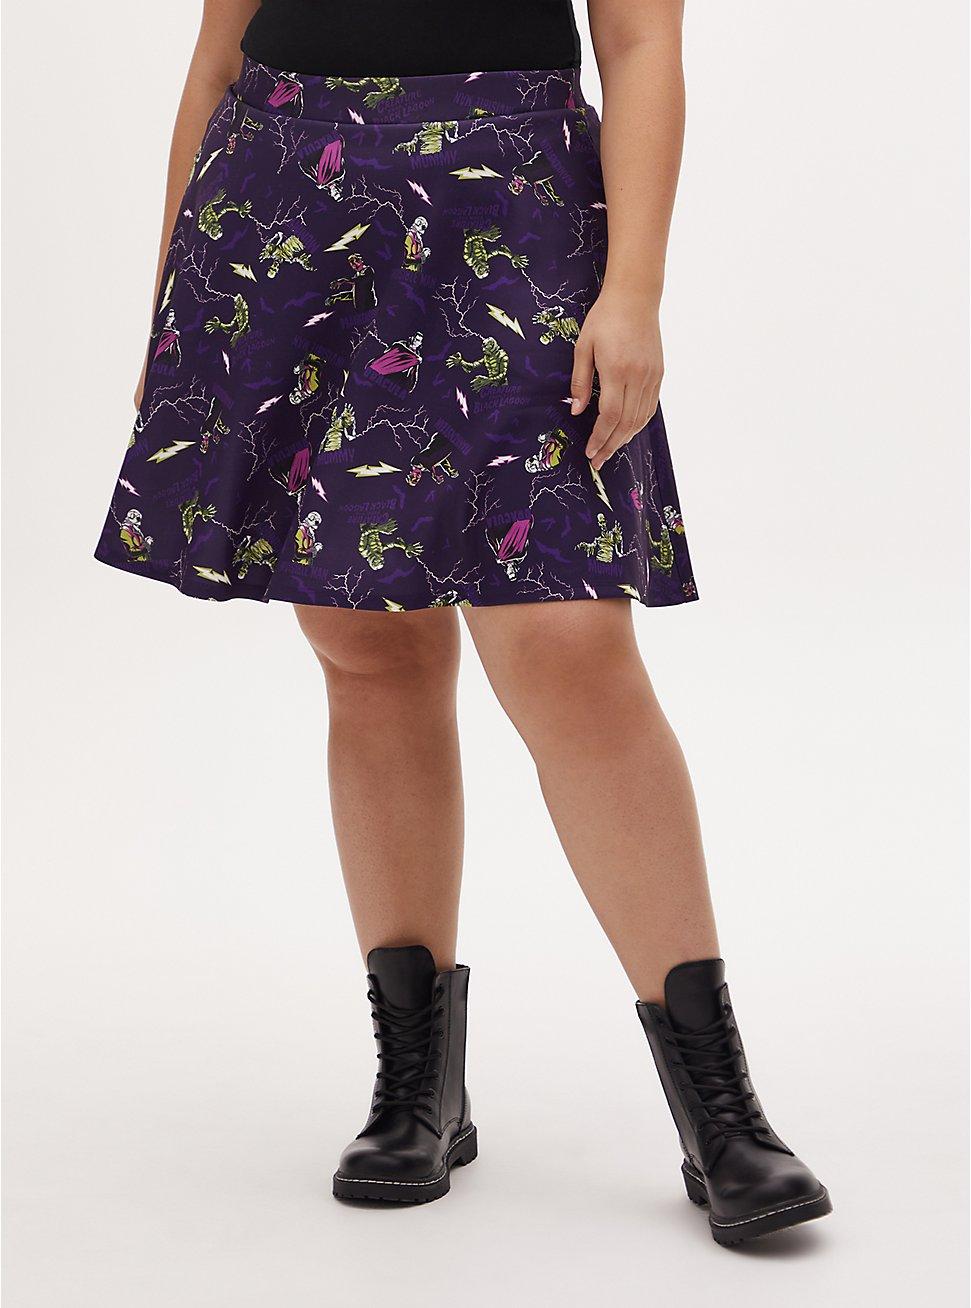 Plus Size Universal Monster's Purple Scuba Knit Skater Skirt , MULTI, hi-res